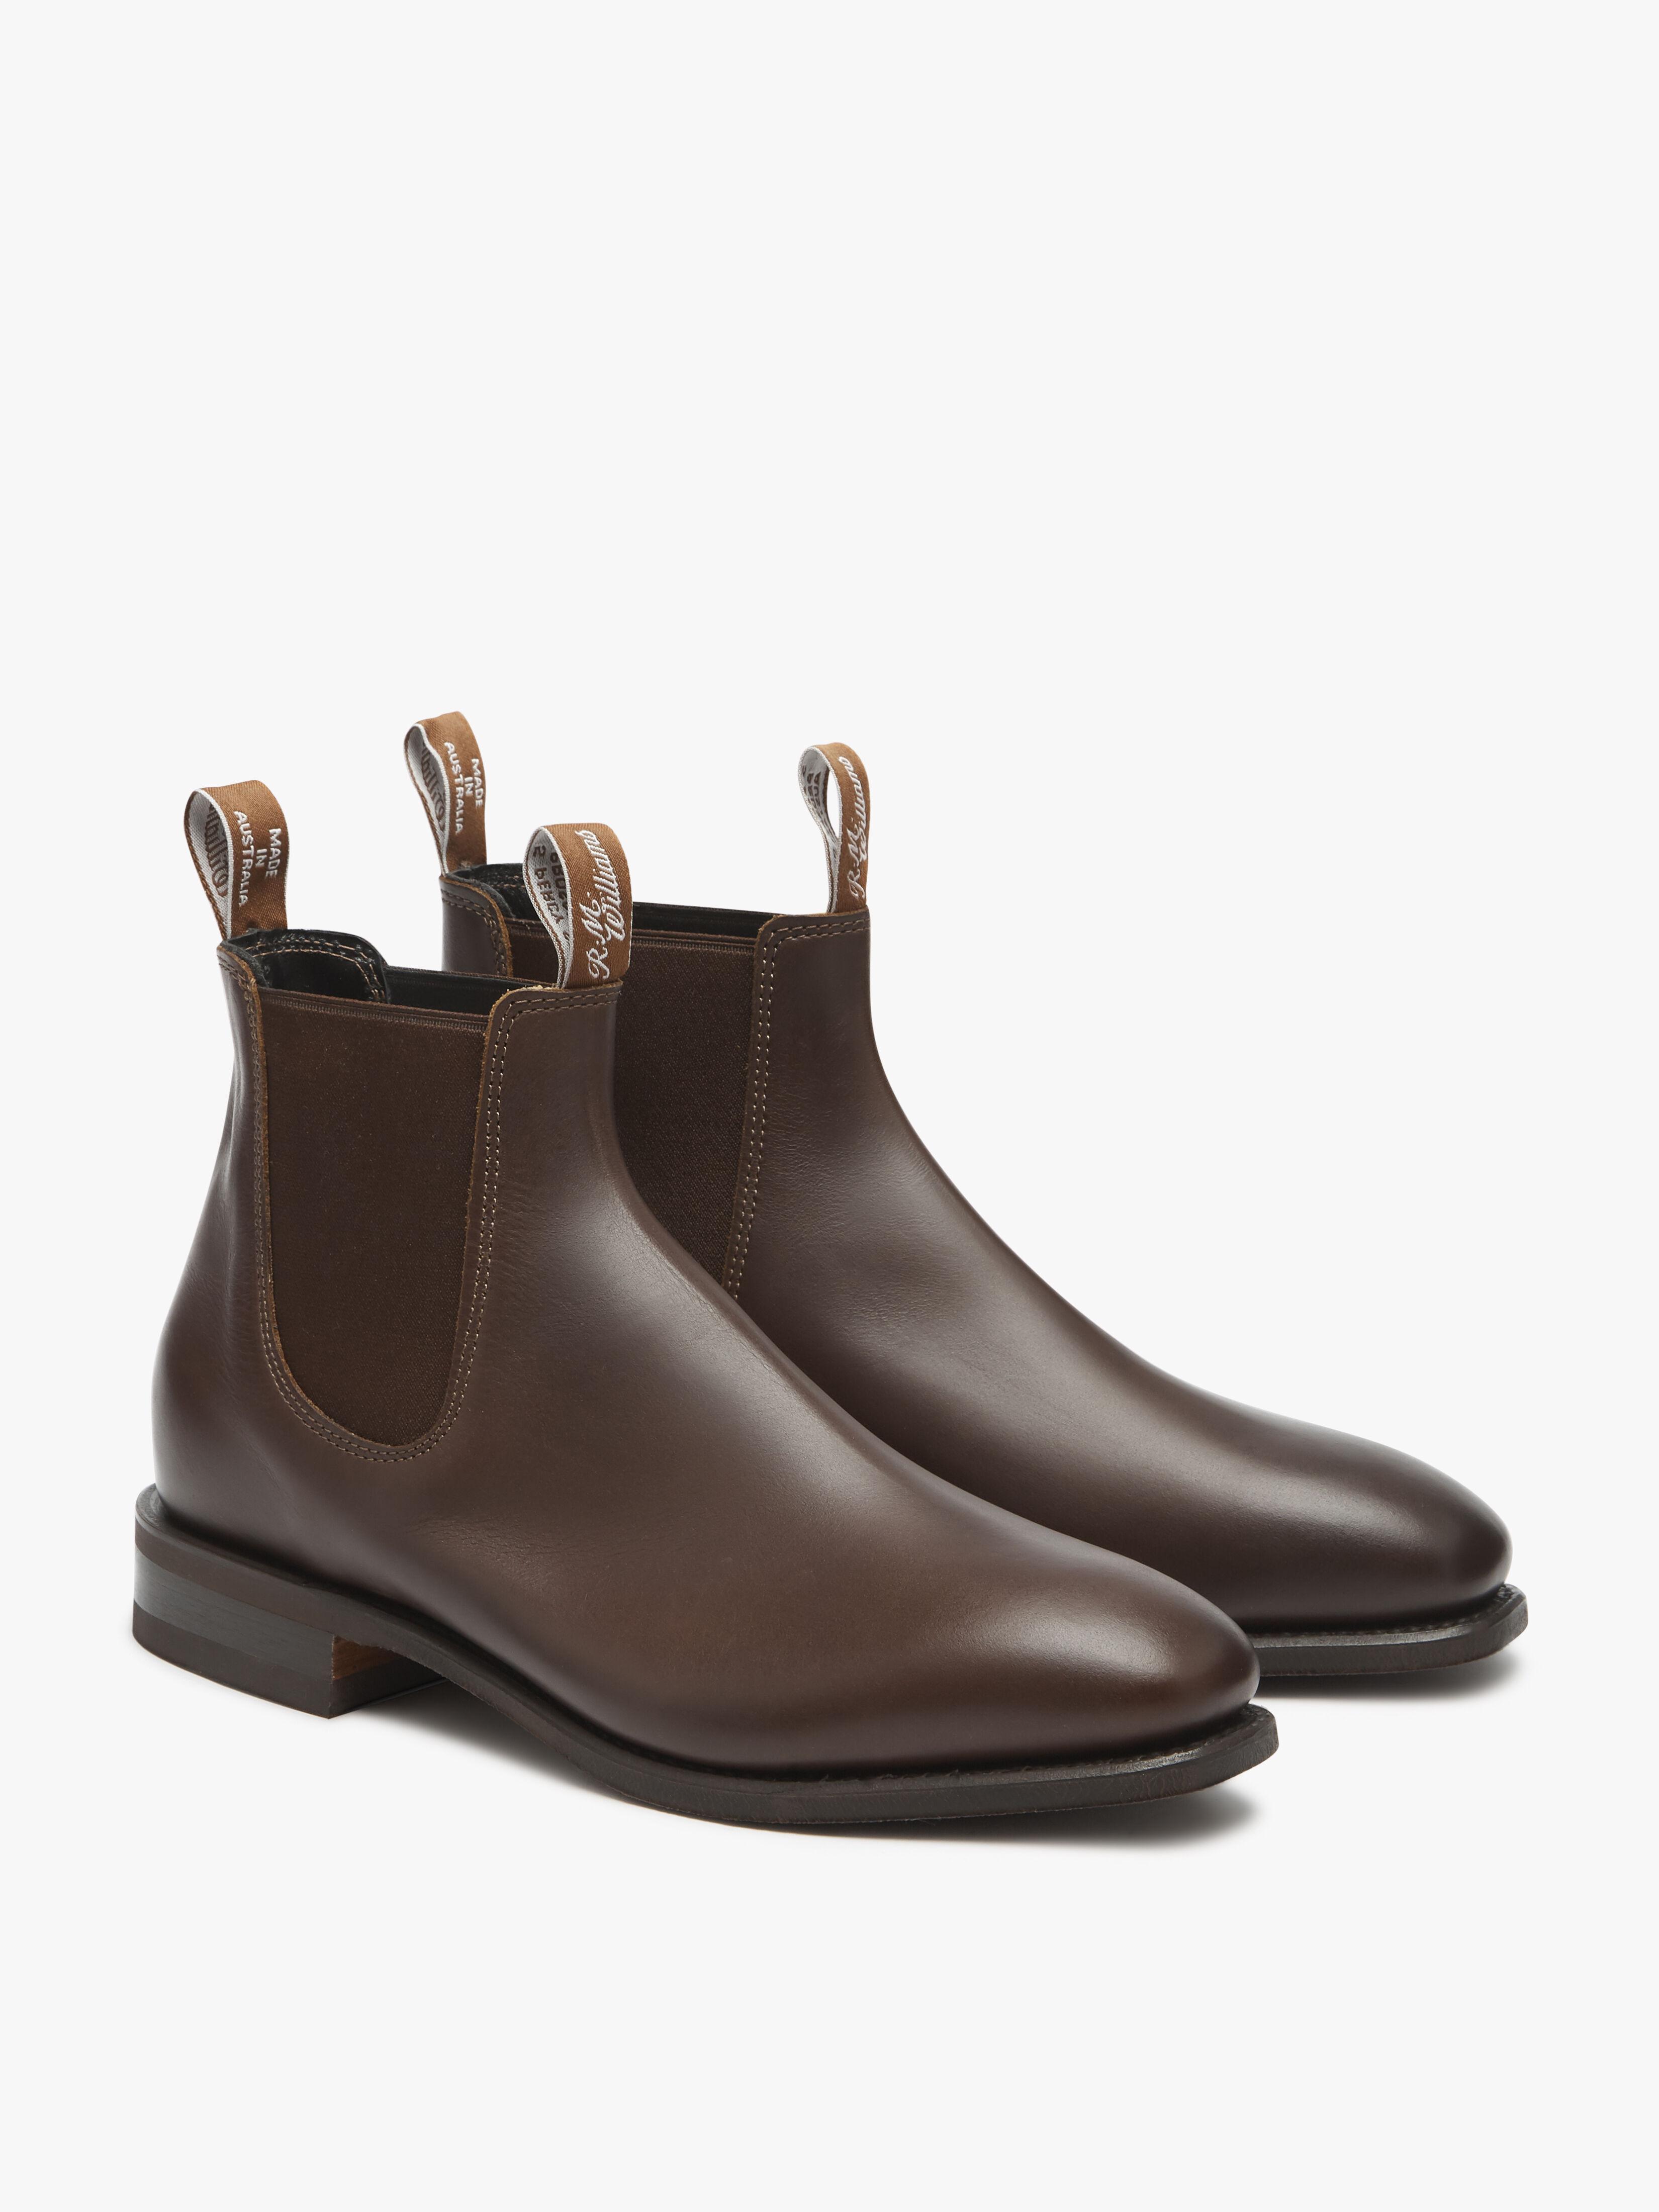 R. M. Williams Comfort Craftsman Mens Chelsea Boots in